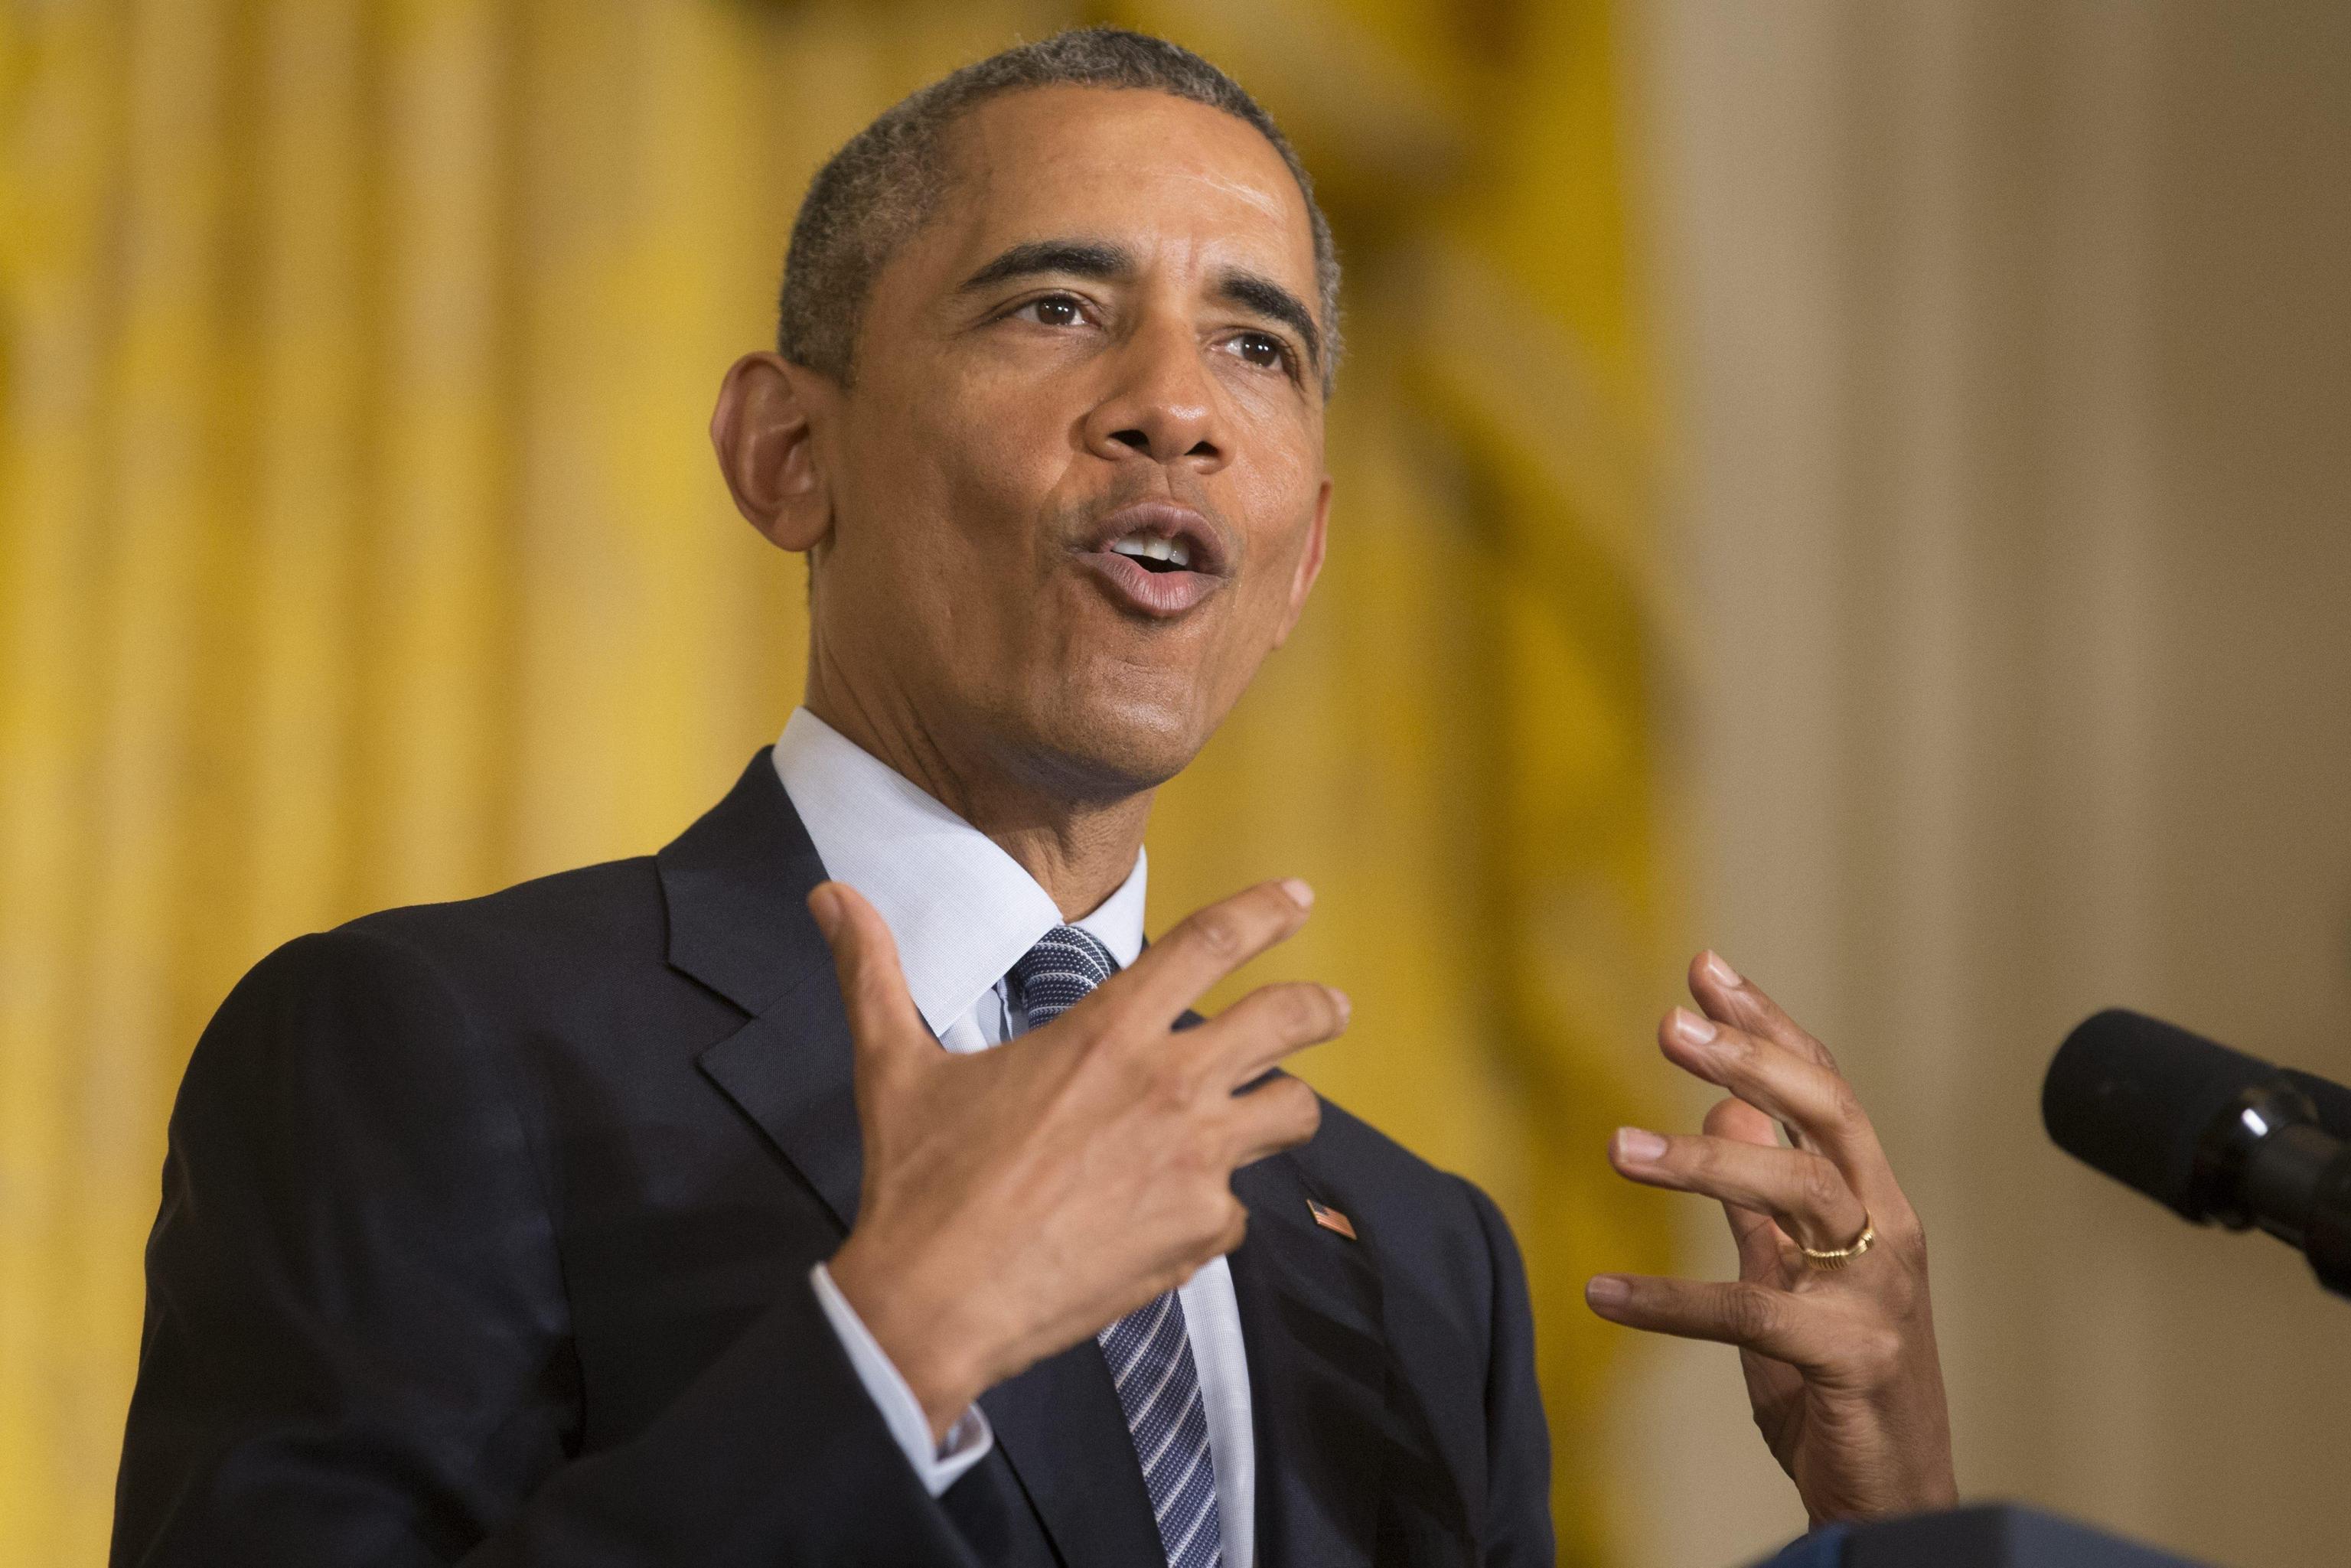 President Barack Obama delivers remarks outlining his clean power plan